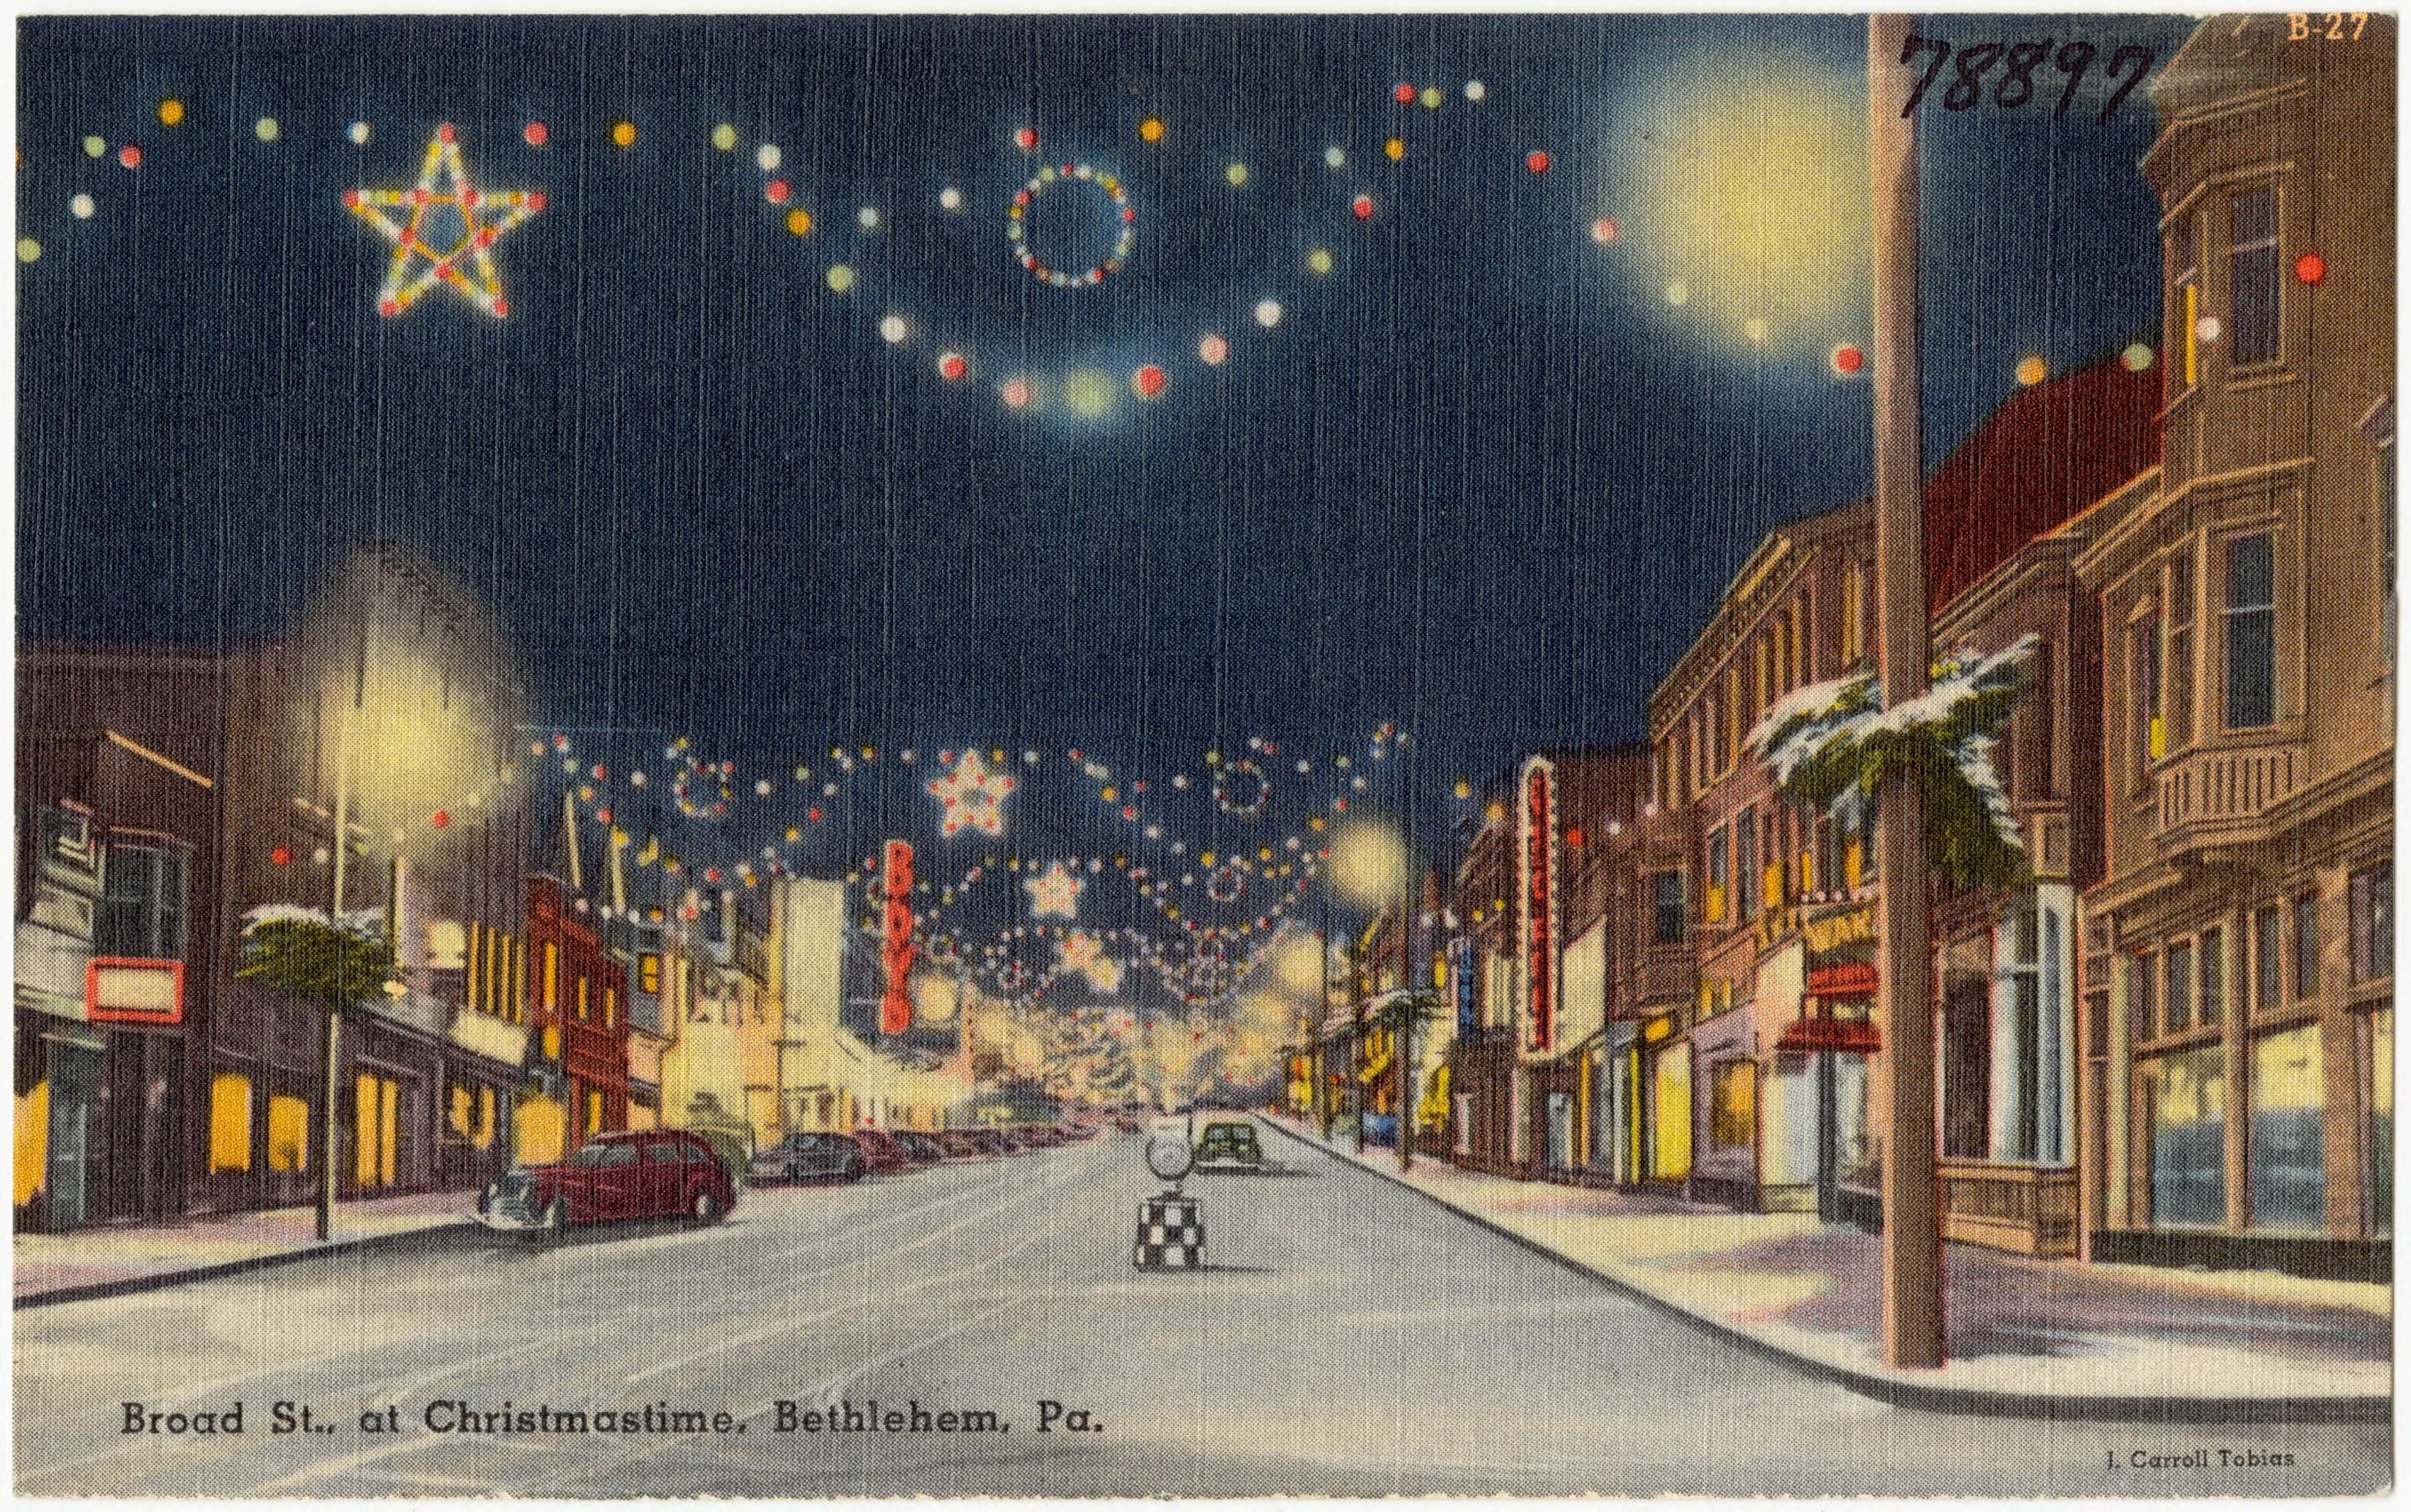 FileBroad St At Christmastime Bethlehem Pa 78897